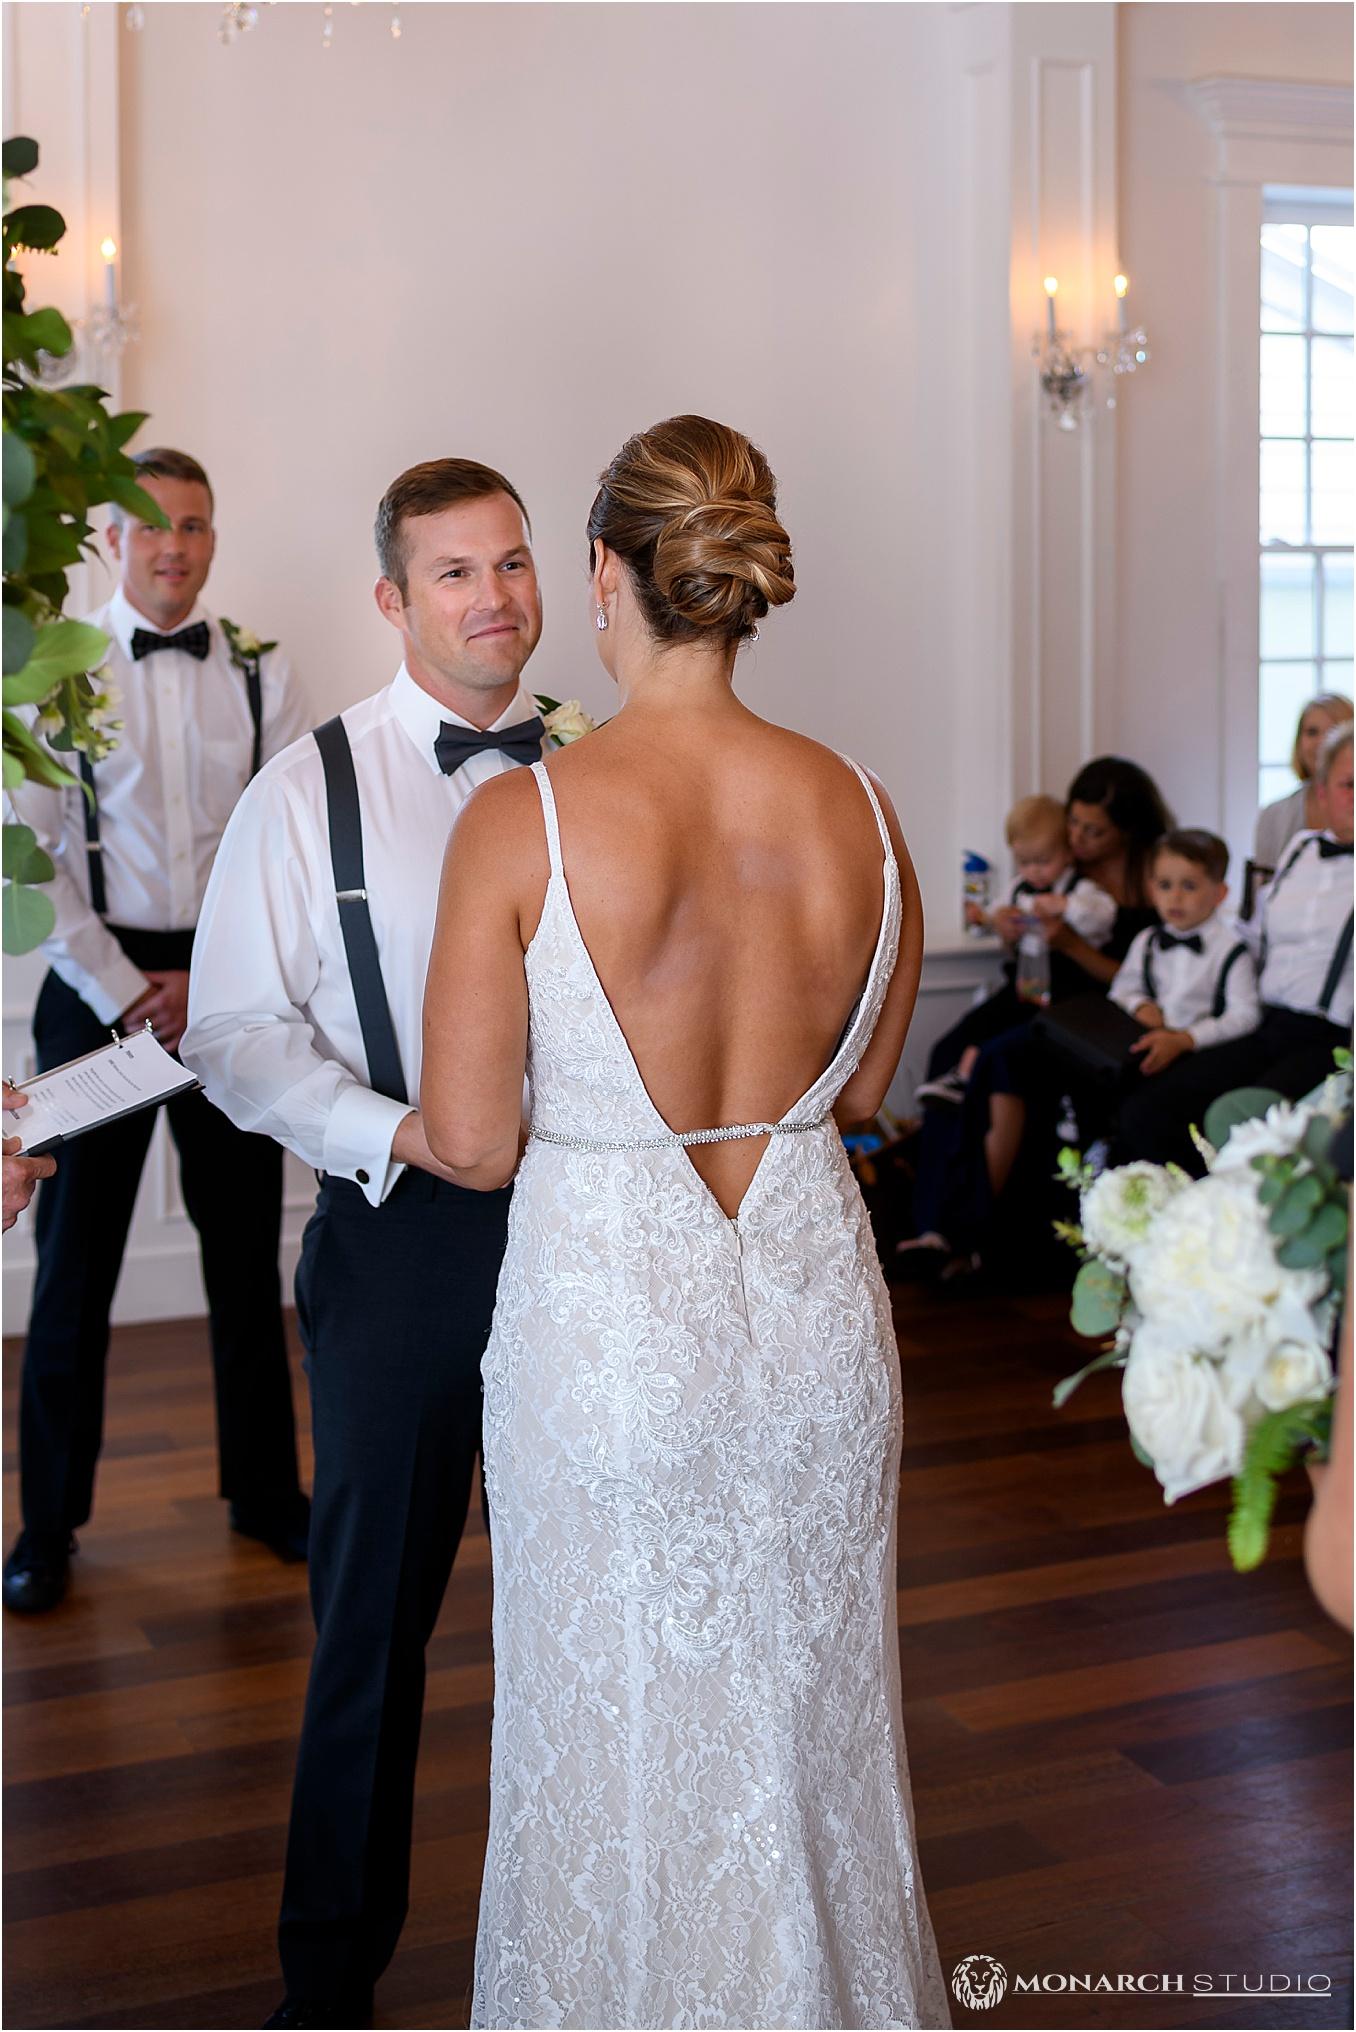 069-whiteroom-wedding-photographer-2019-05-22_0051.jpg